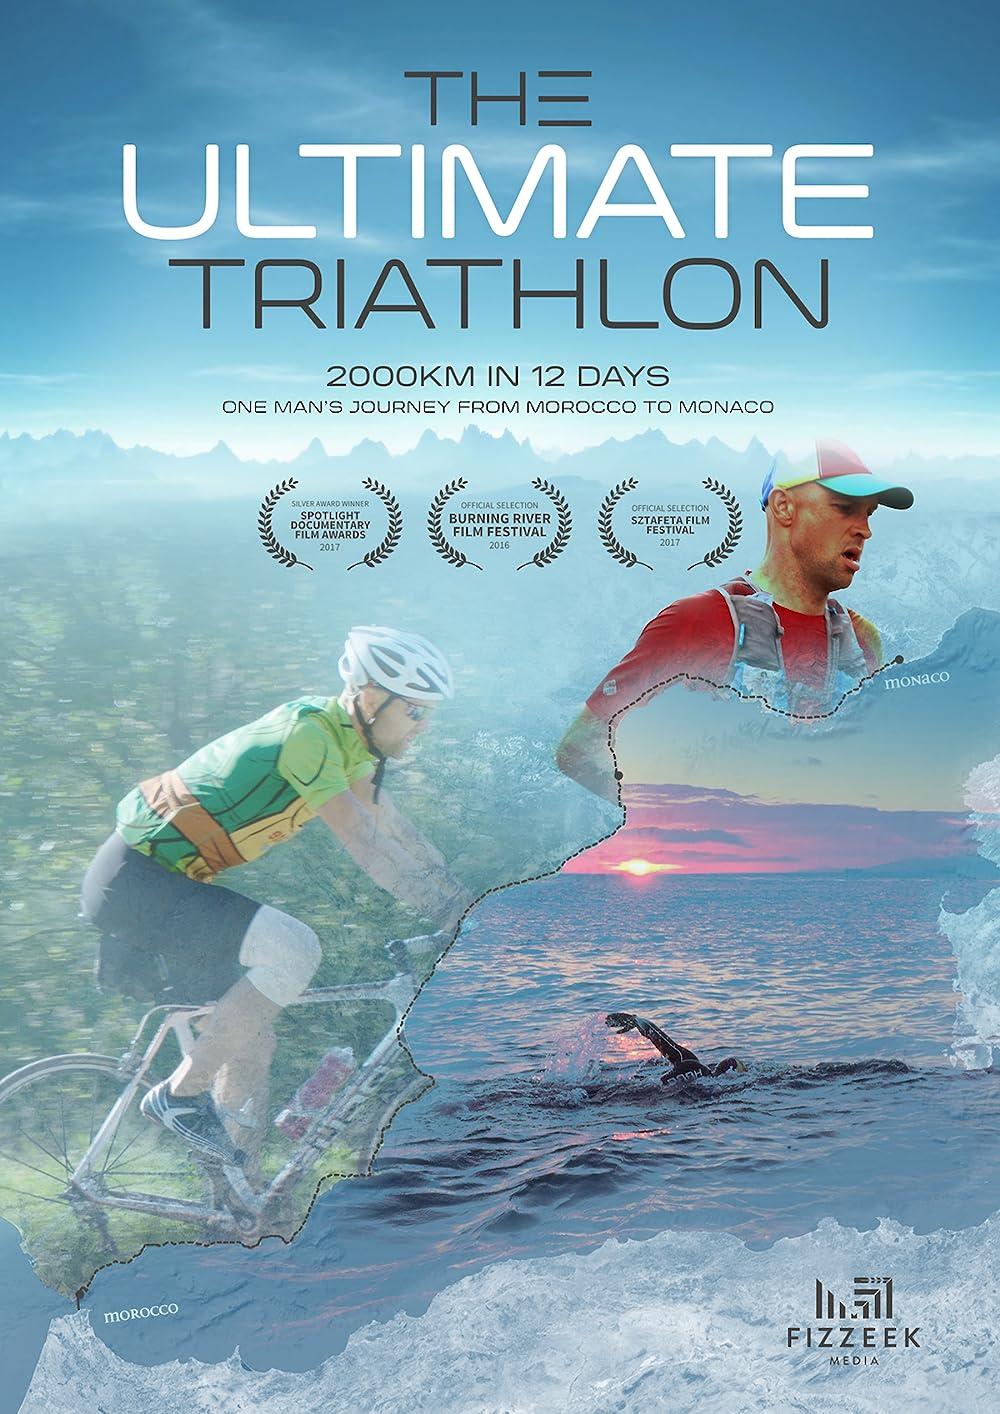 The Ultimate Triathlon 2016